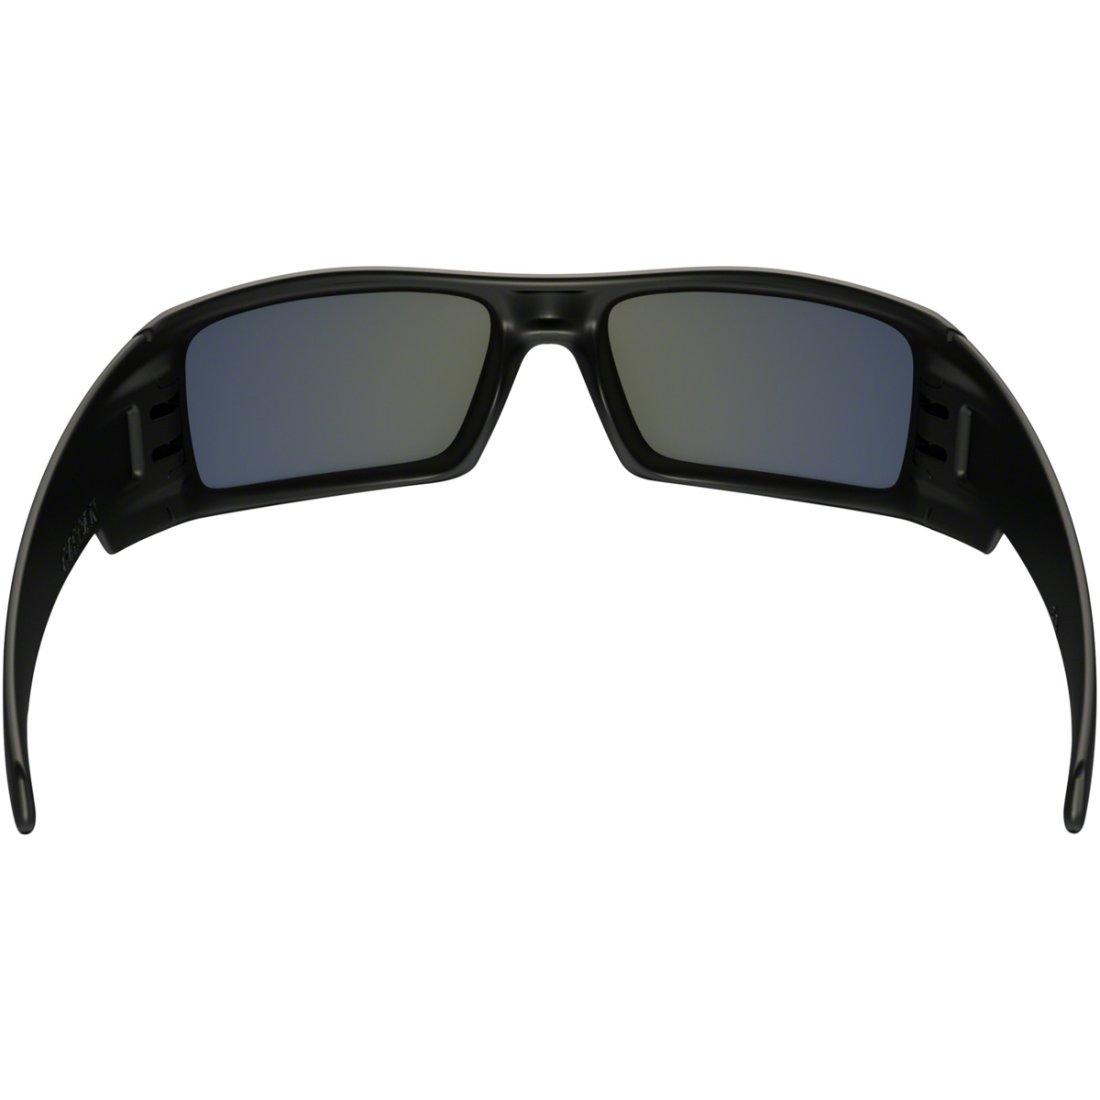 004822e52231 ... usa oakley gascan matte black emerald iridium mask goggle 6ba5a 3ab4a